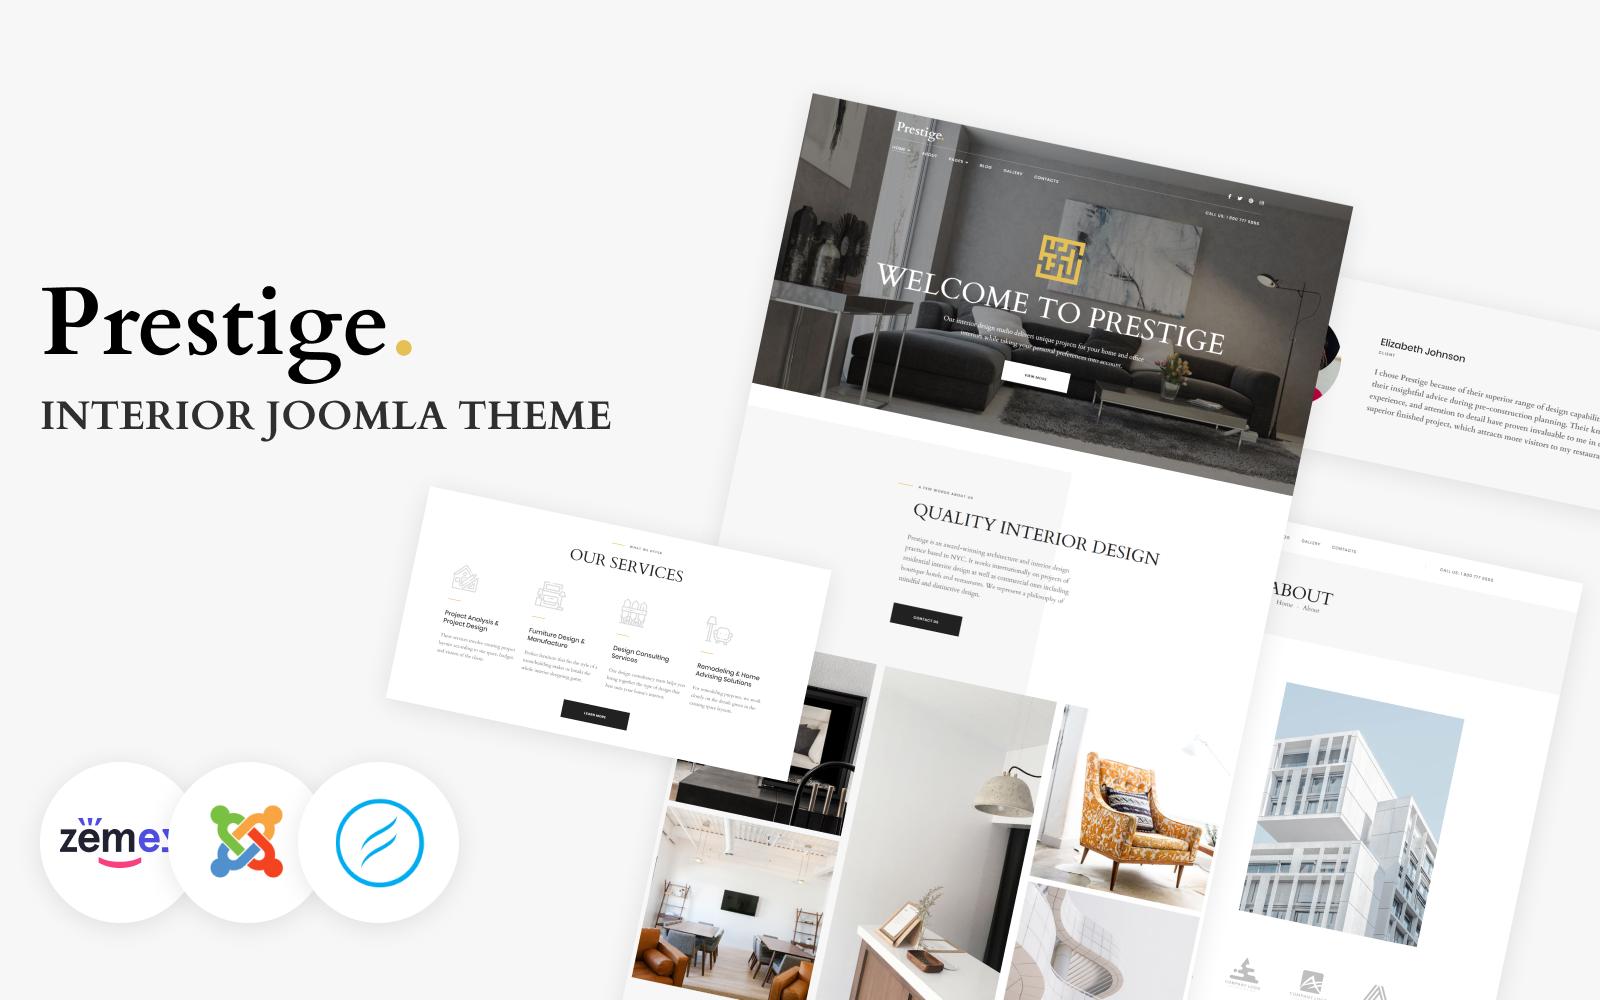 Prestige - Interior Design Multipage Joomla Template